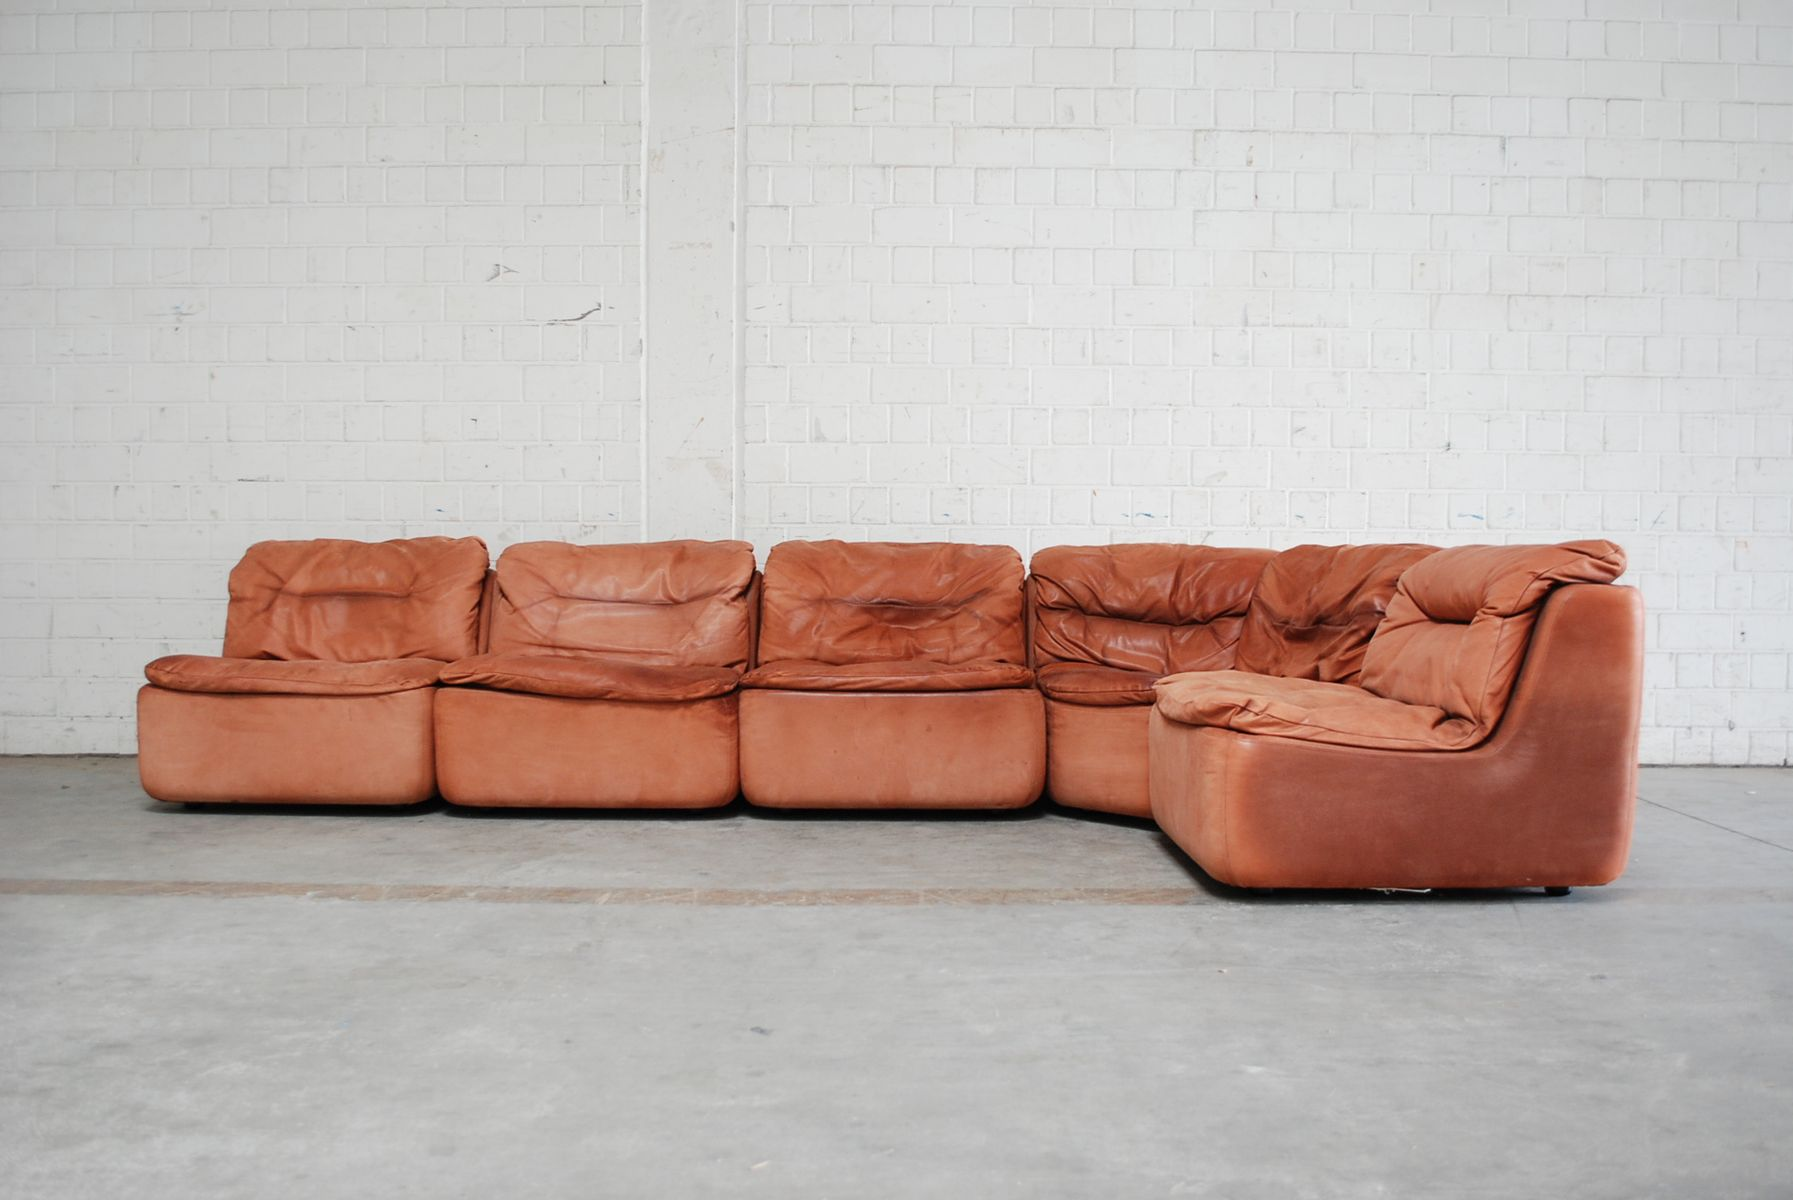 Plus modular leather sofa by friedrich hill for walter knoll for plus modular leather sofa by friedrich hill for walter knoll for sale at pamono parisarafo Gallery